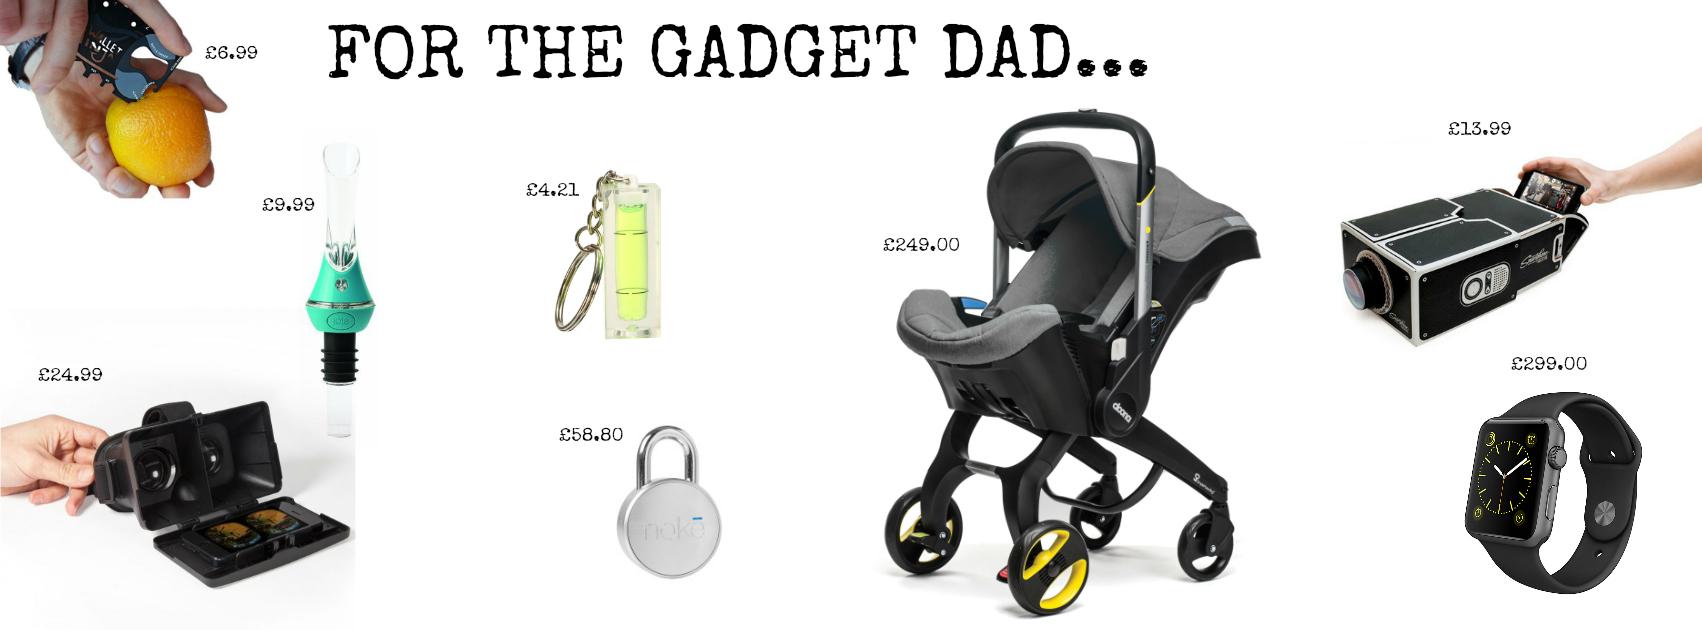 GADGET DAD